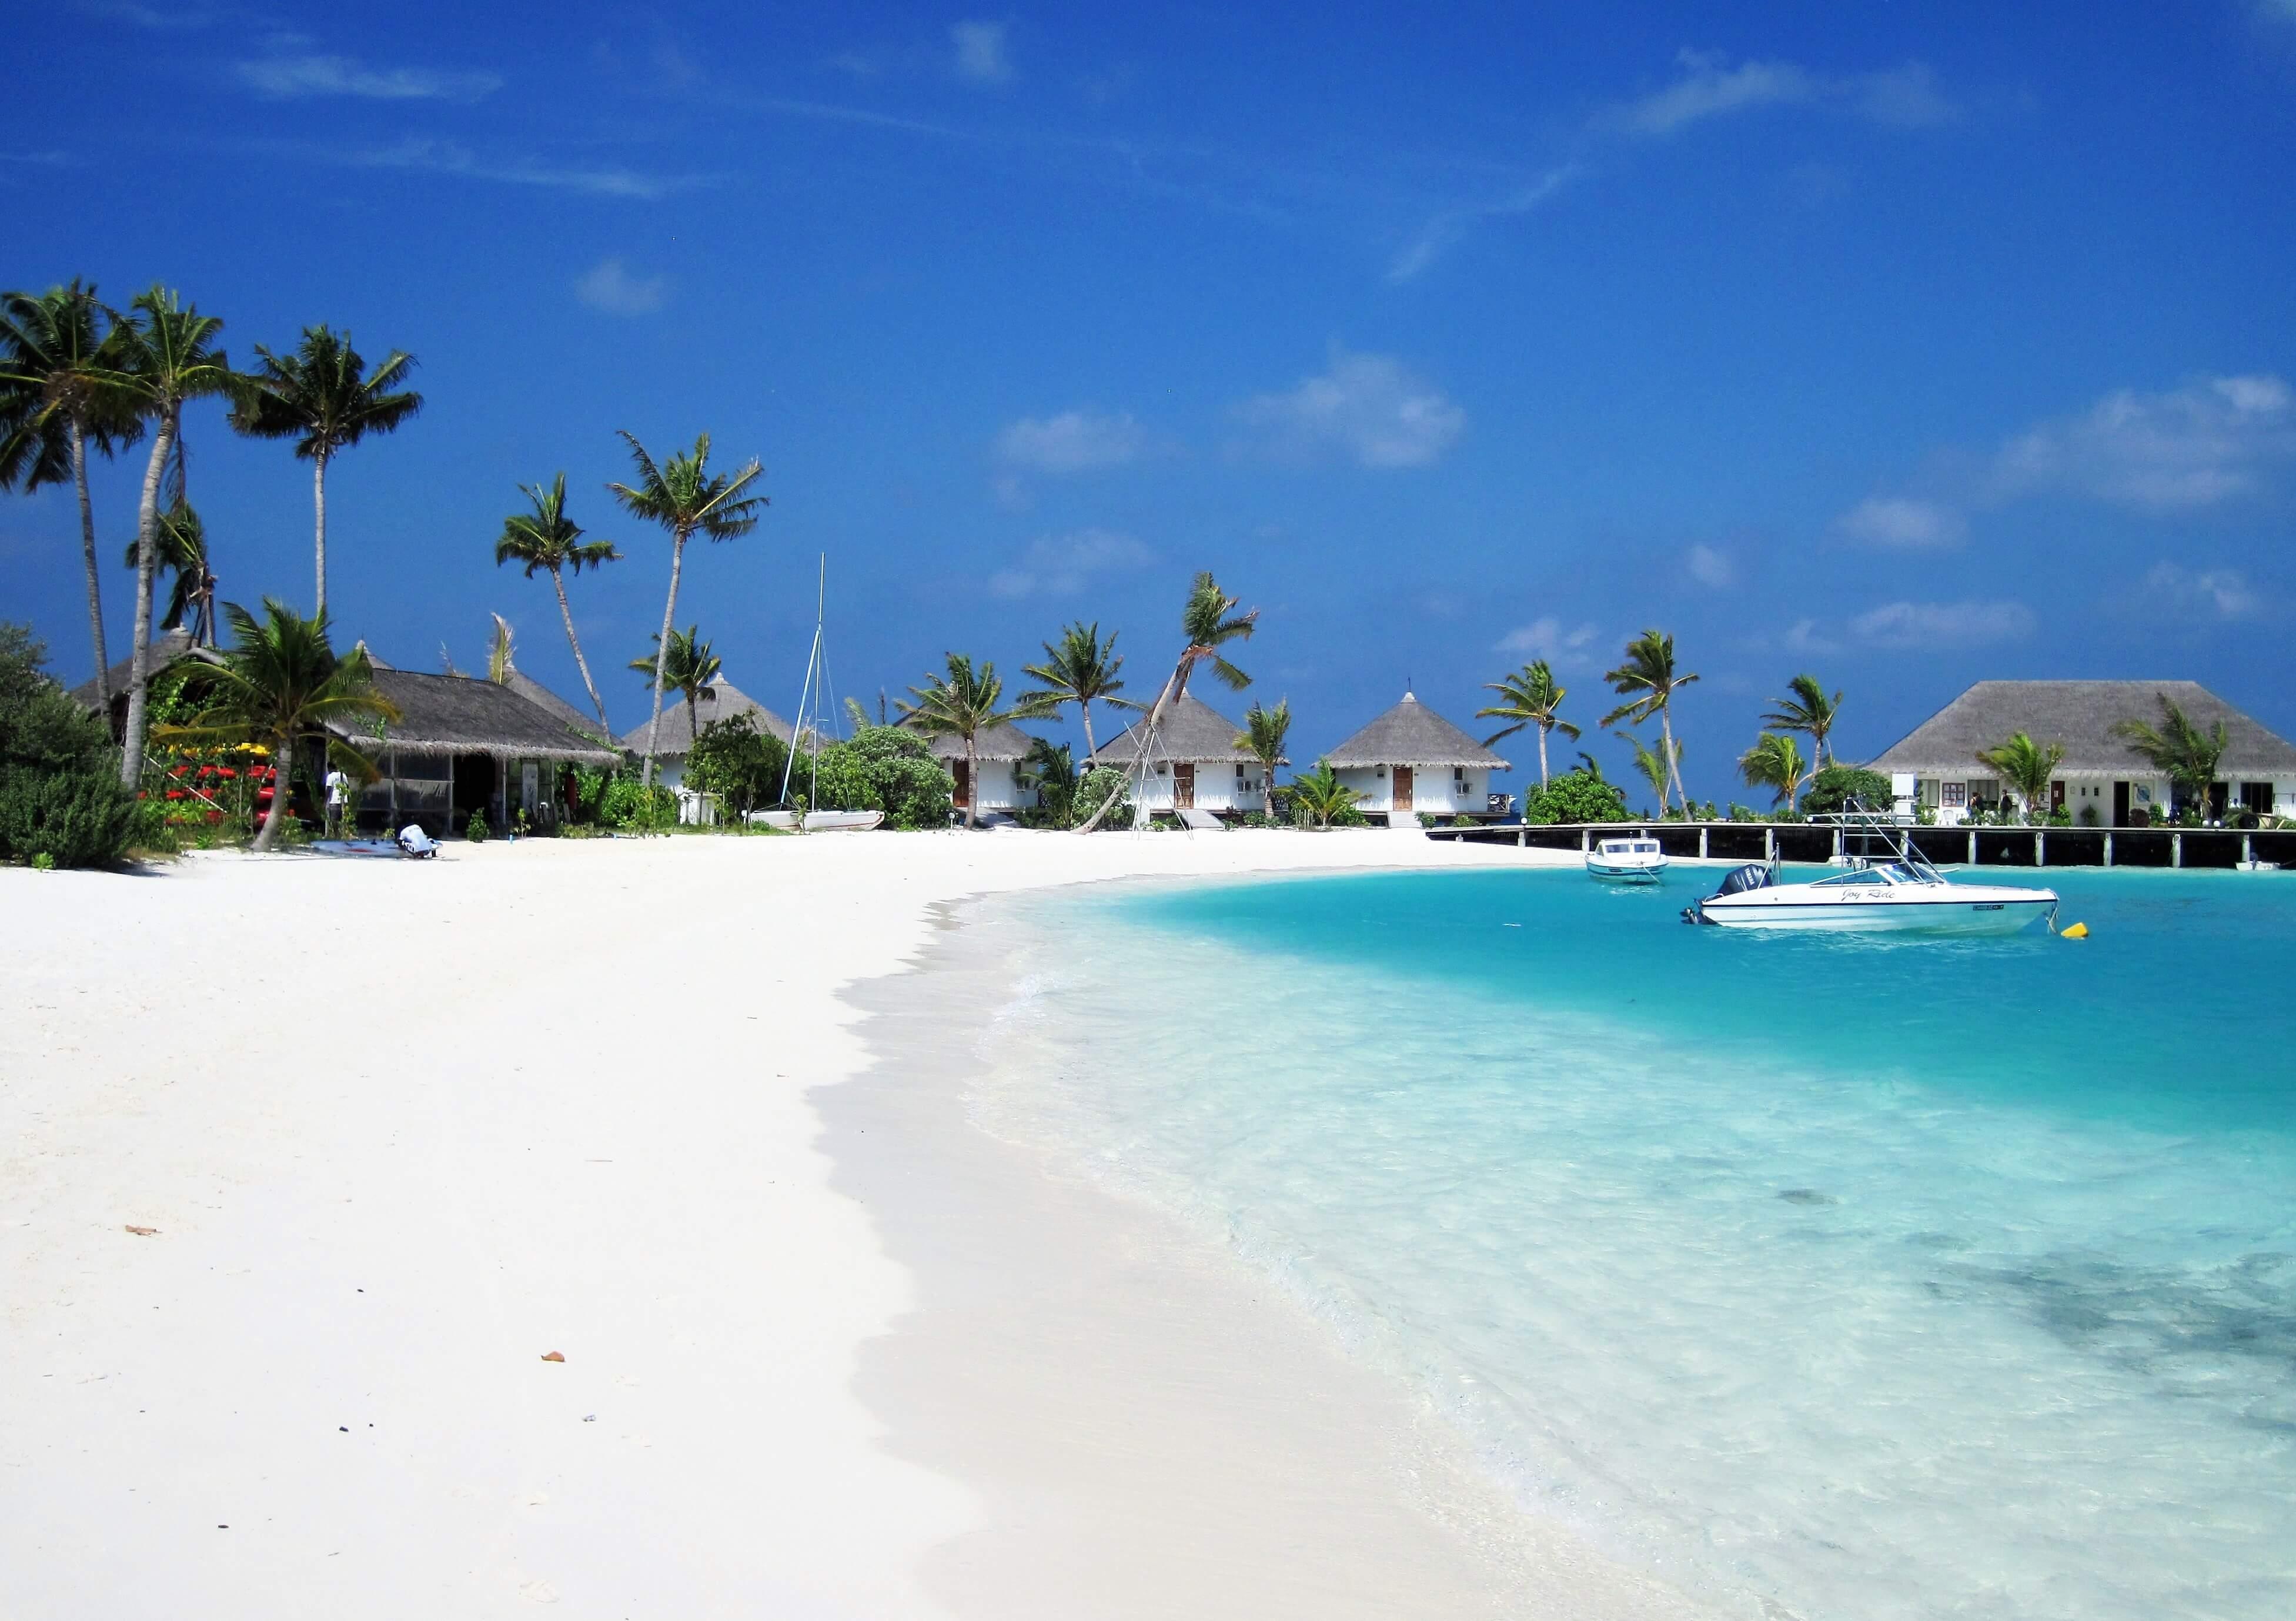 Plage de sable blanc de Safari Island Maldives